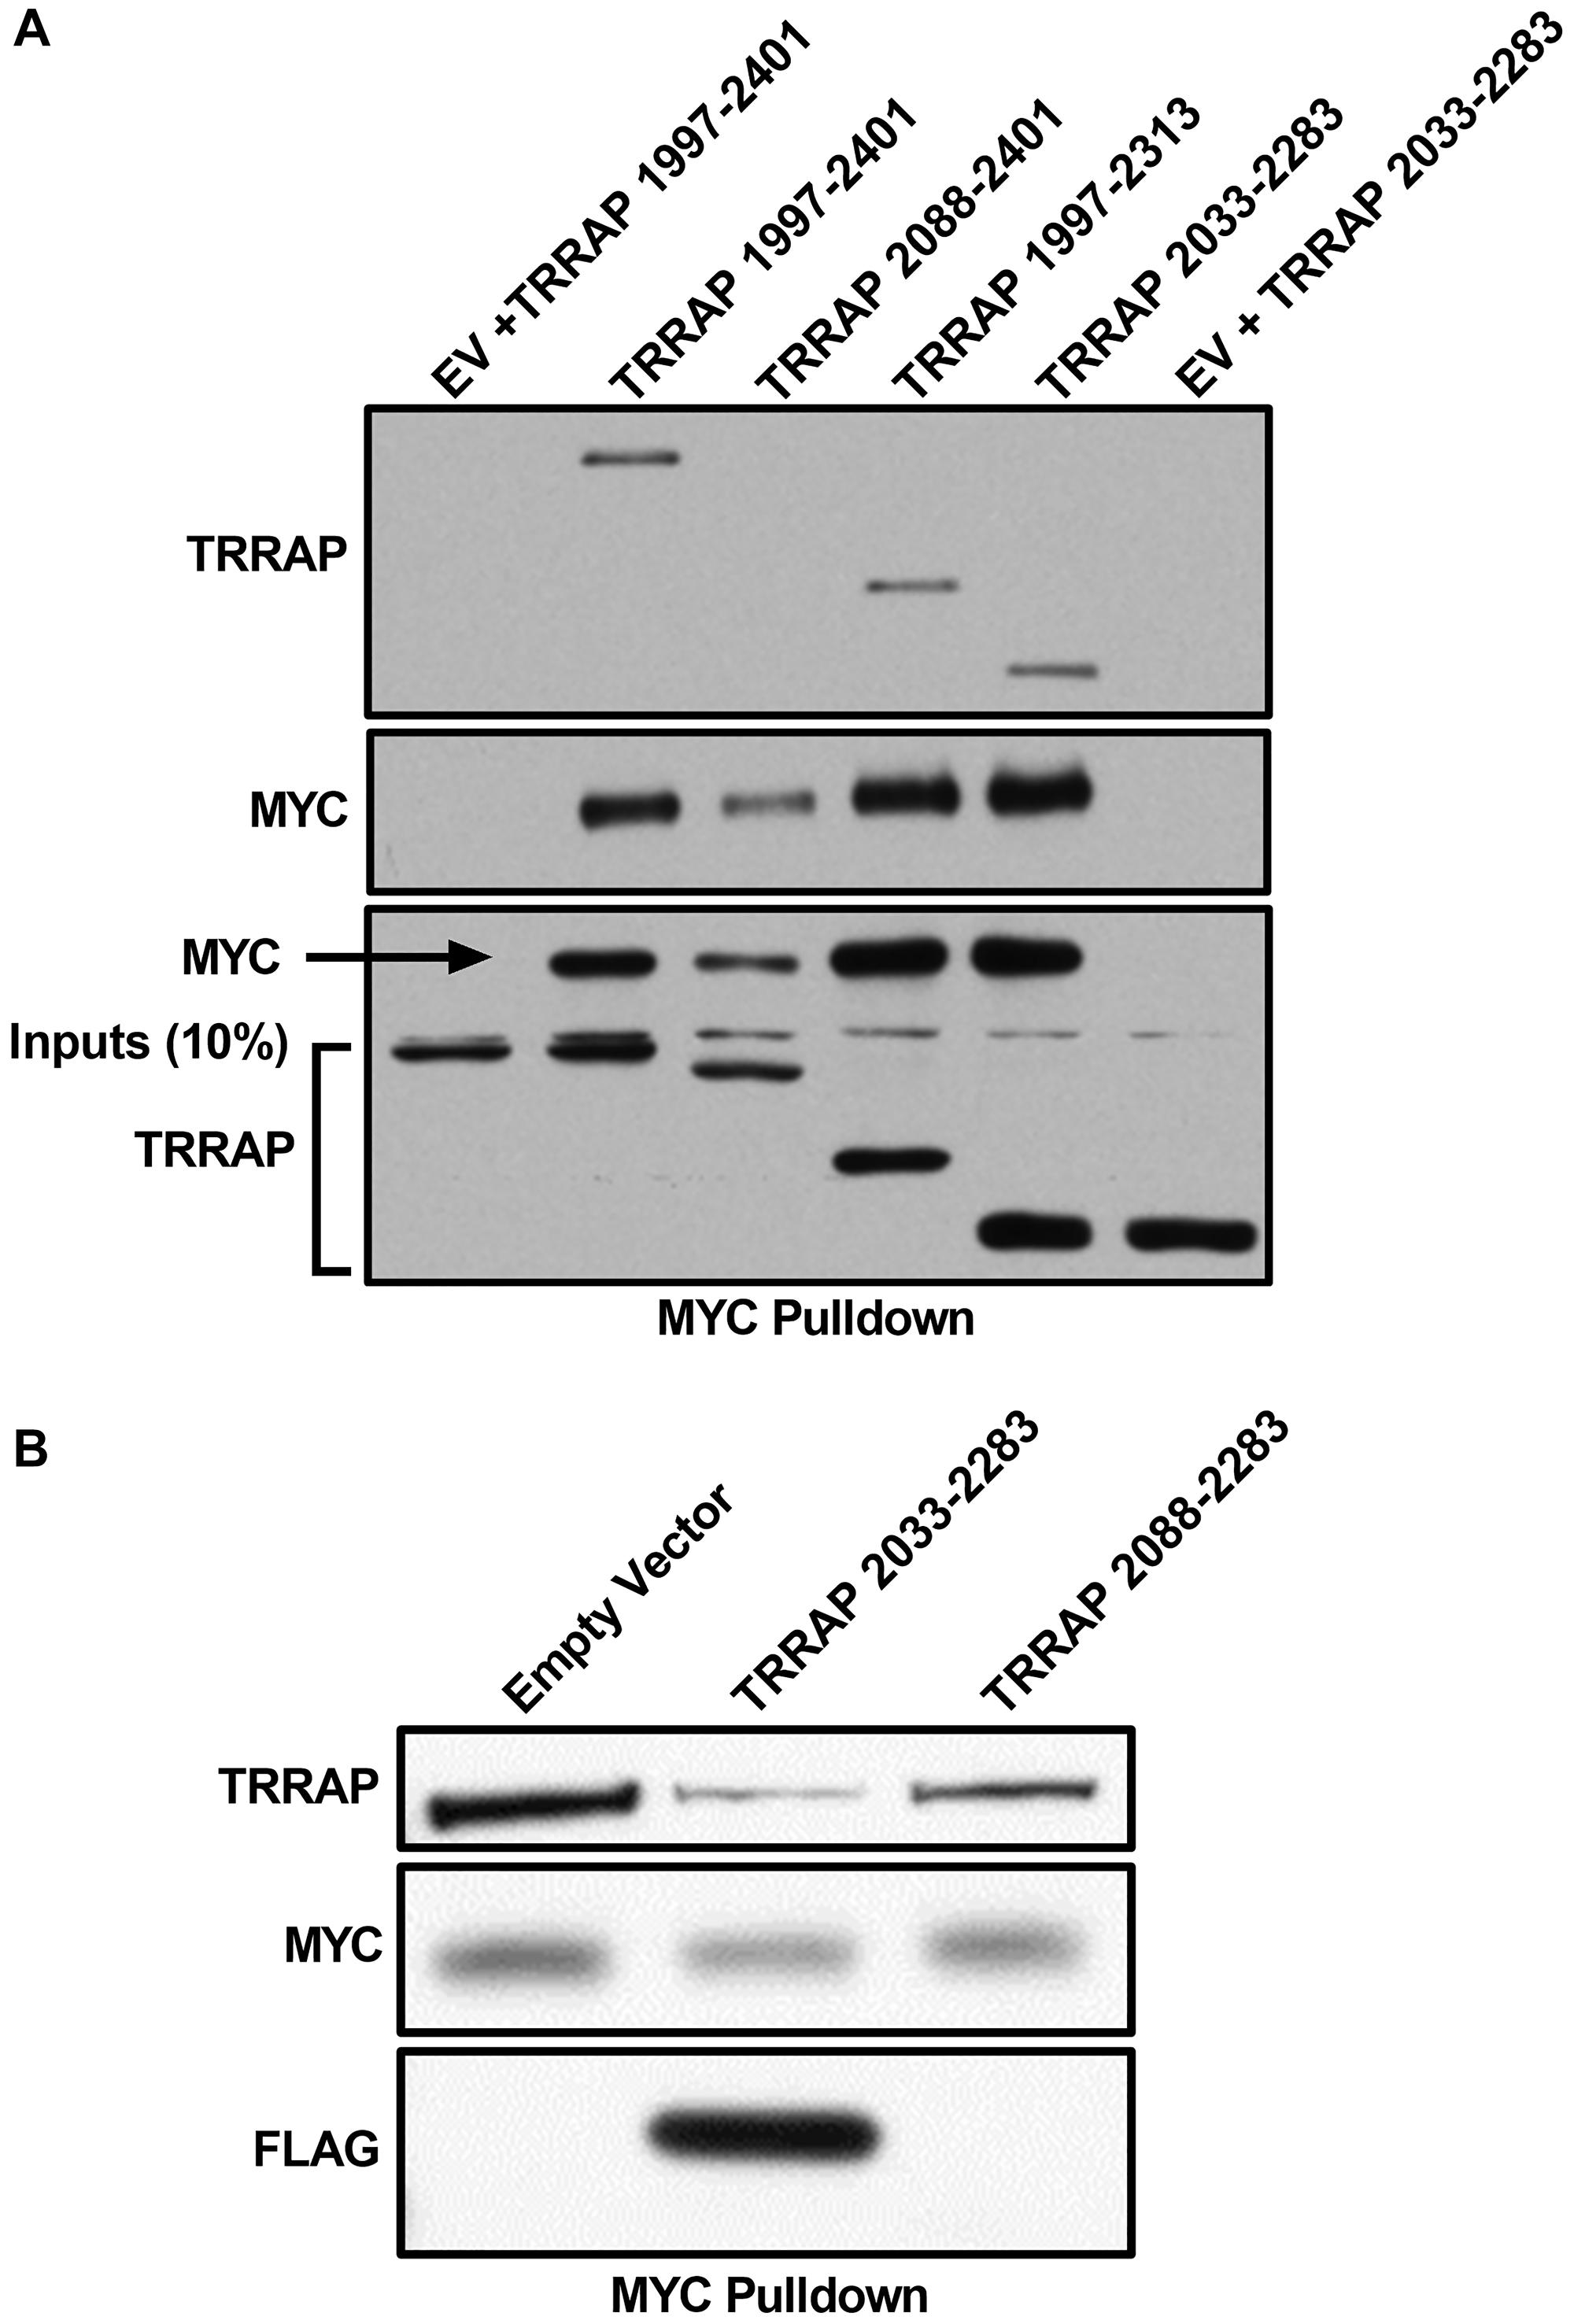 TRRAP 2033-2283 is the minimal MYC-binding domain.